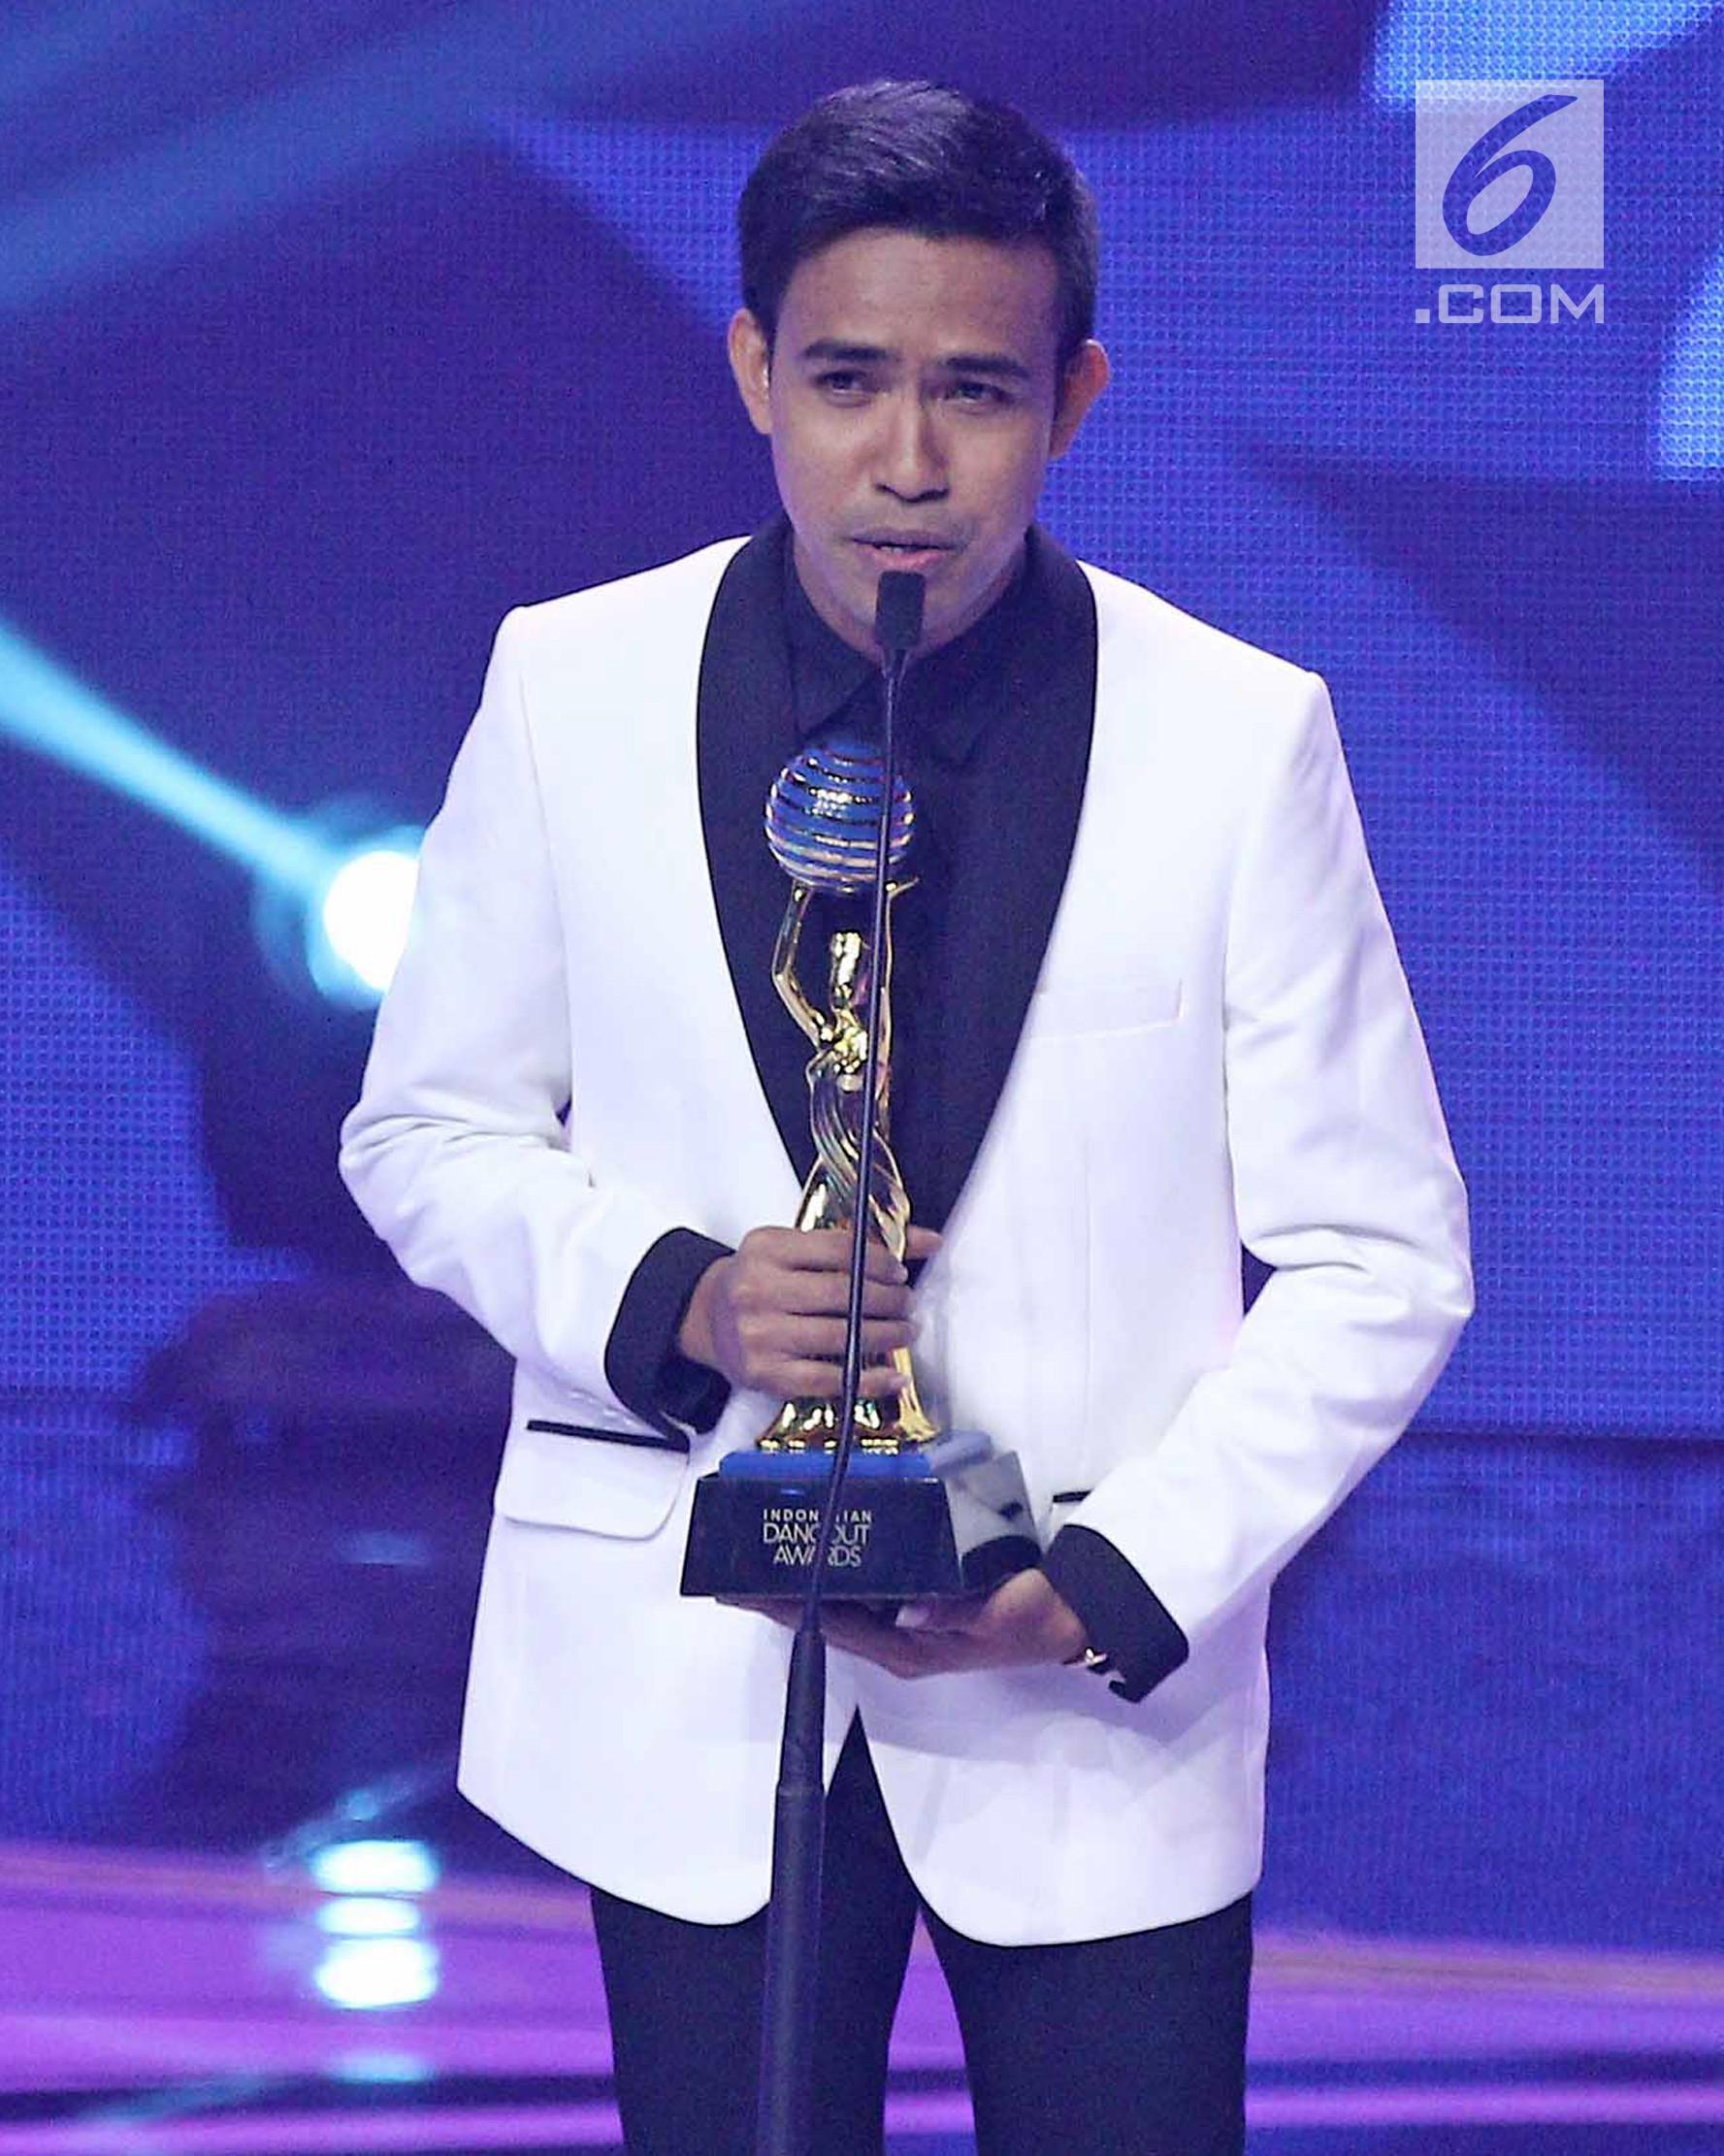 Fildan menerima piala untuk kategori penyanyi dangdut pendatang baru pria terbaik dalam ajang Indonesian Dangdut Awards 2017 di Studio 6 EMTEK CITY, Jakarta, Jumat (13/10). (Liputan6.com/Herman Zakharia)